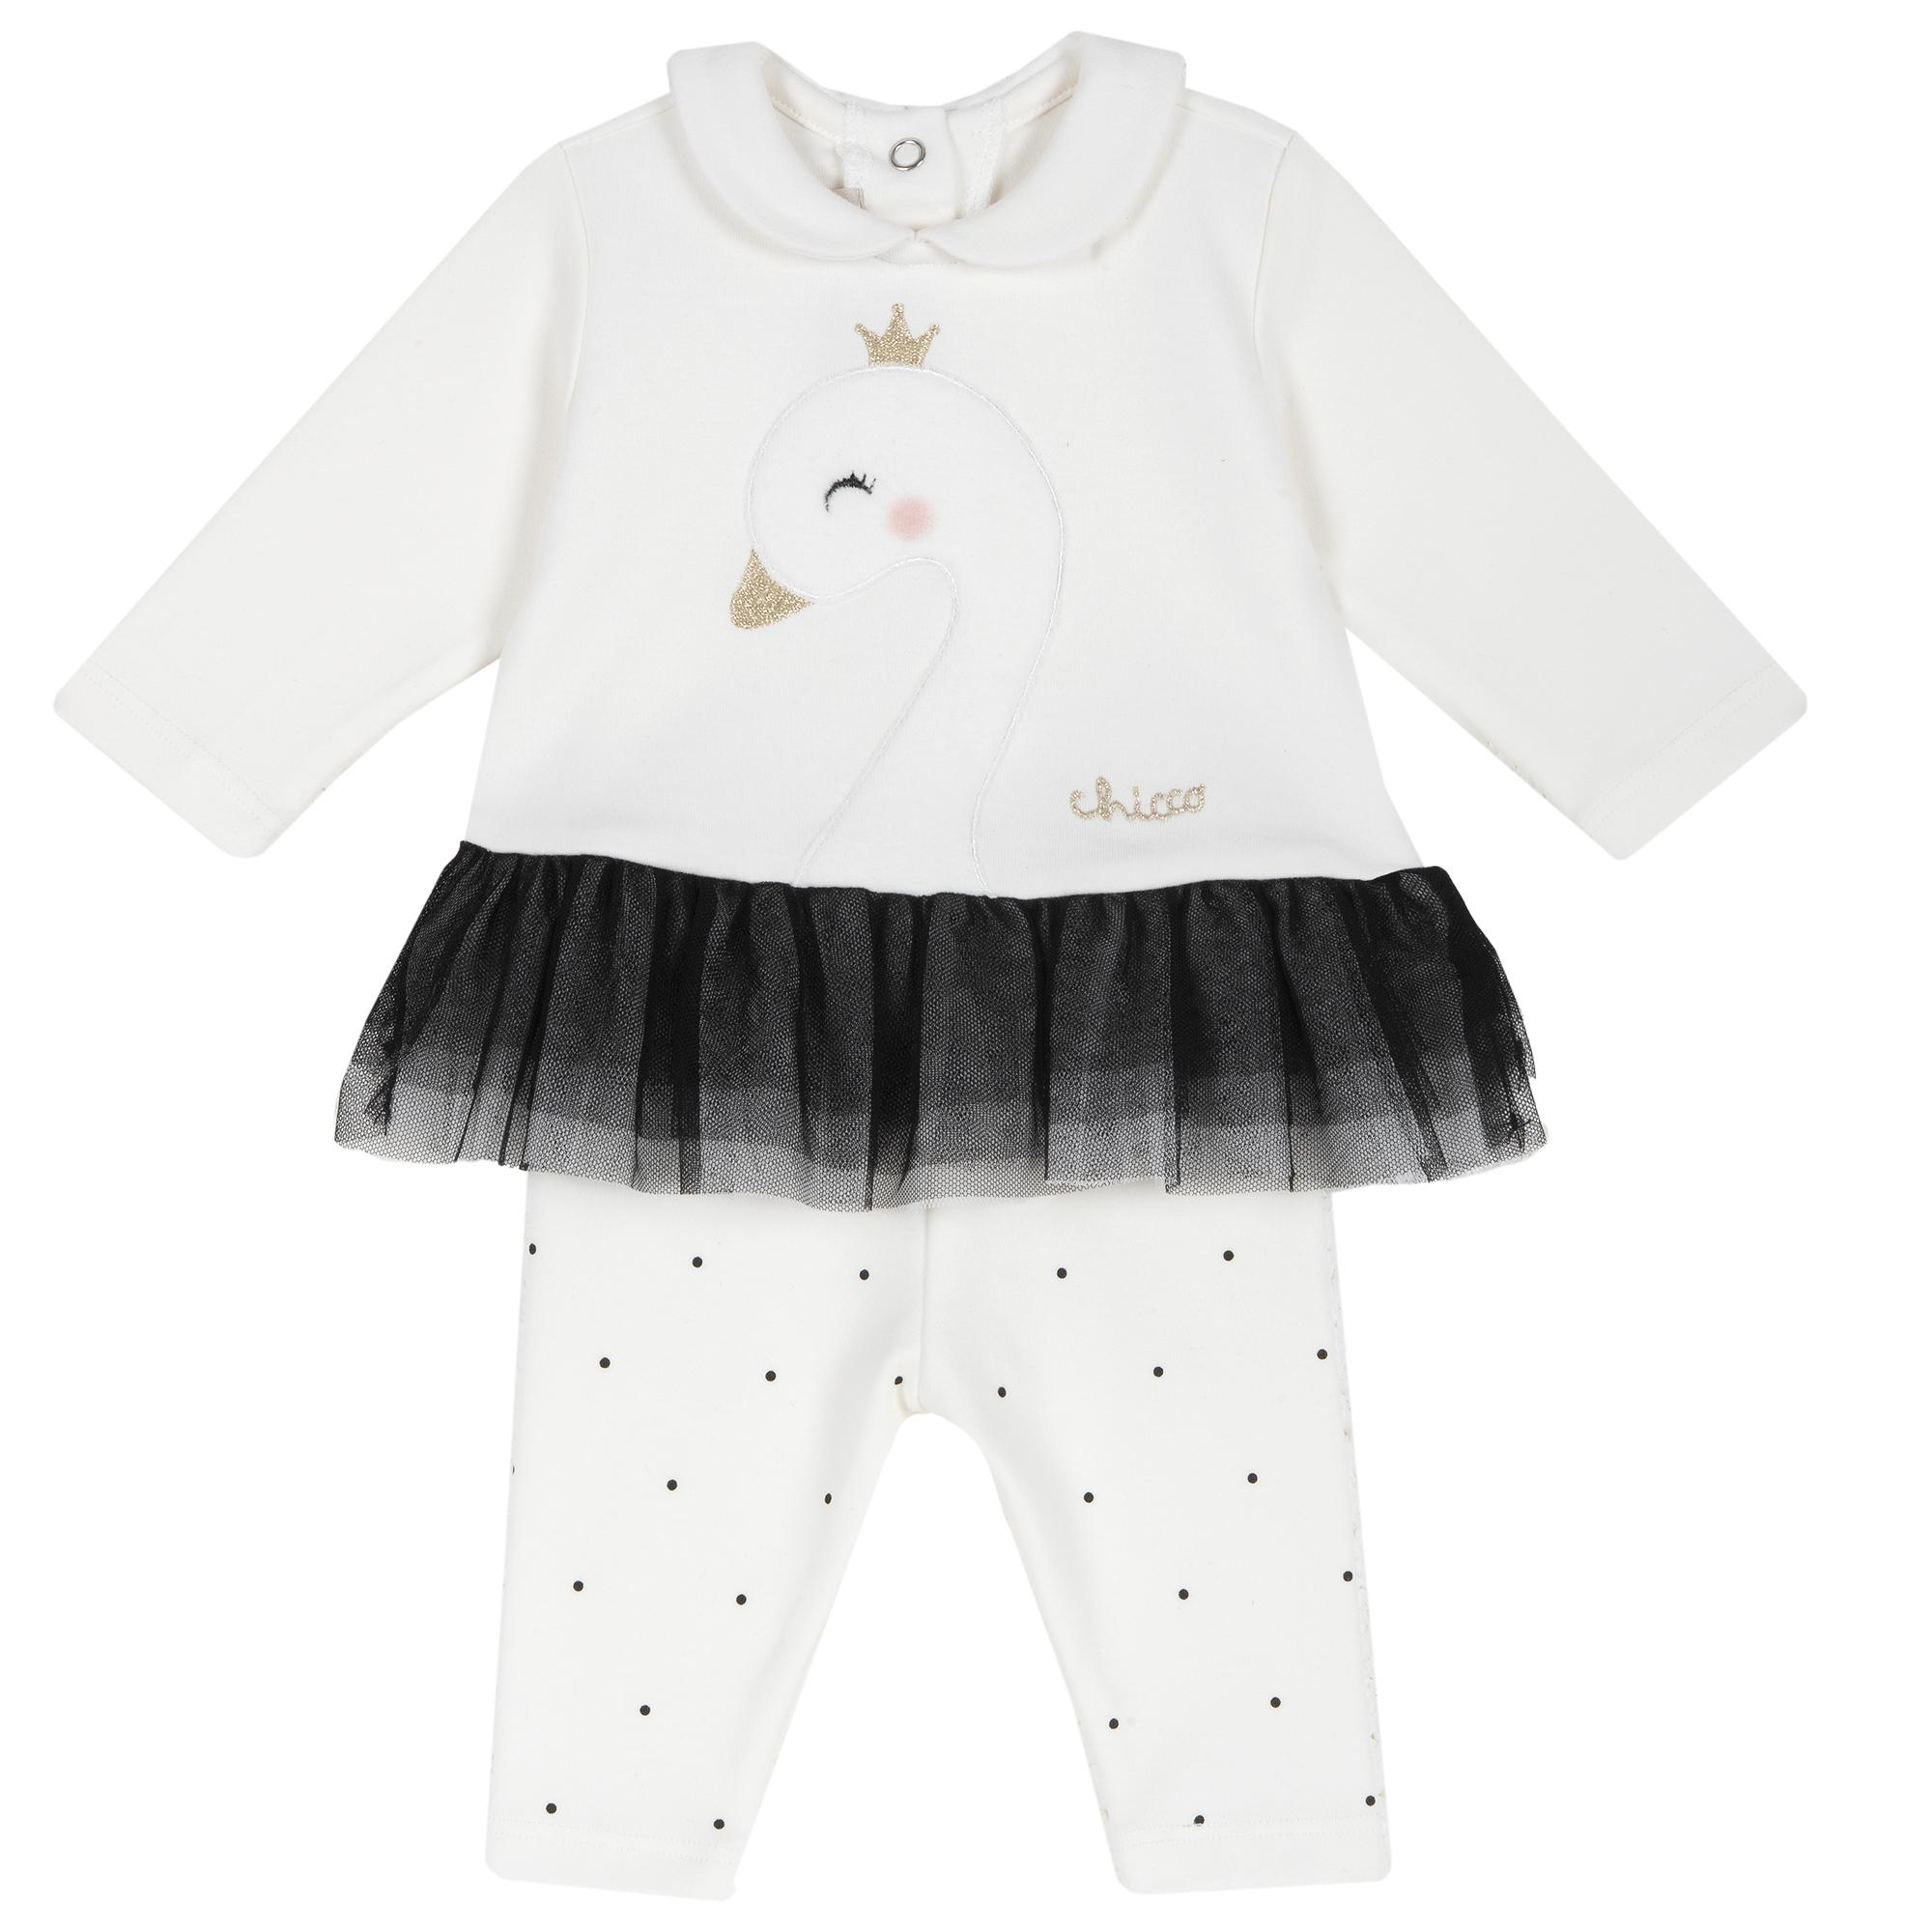 Set Doua Piese Copii Chicco, Bluza Si Pantalon, Alb, 73564 imagine